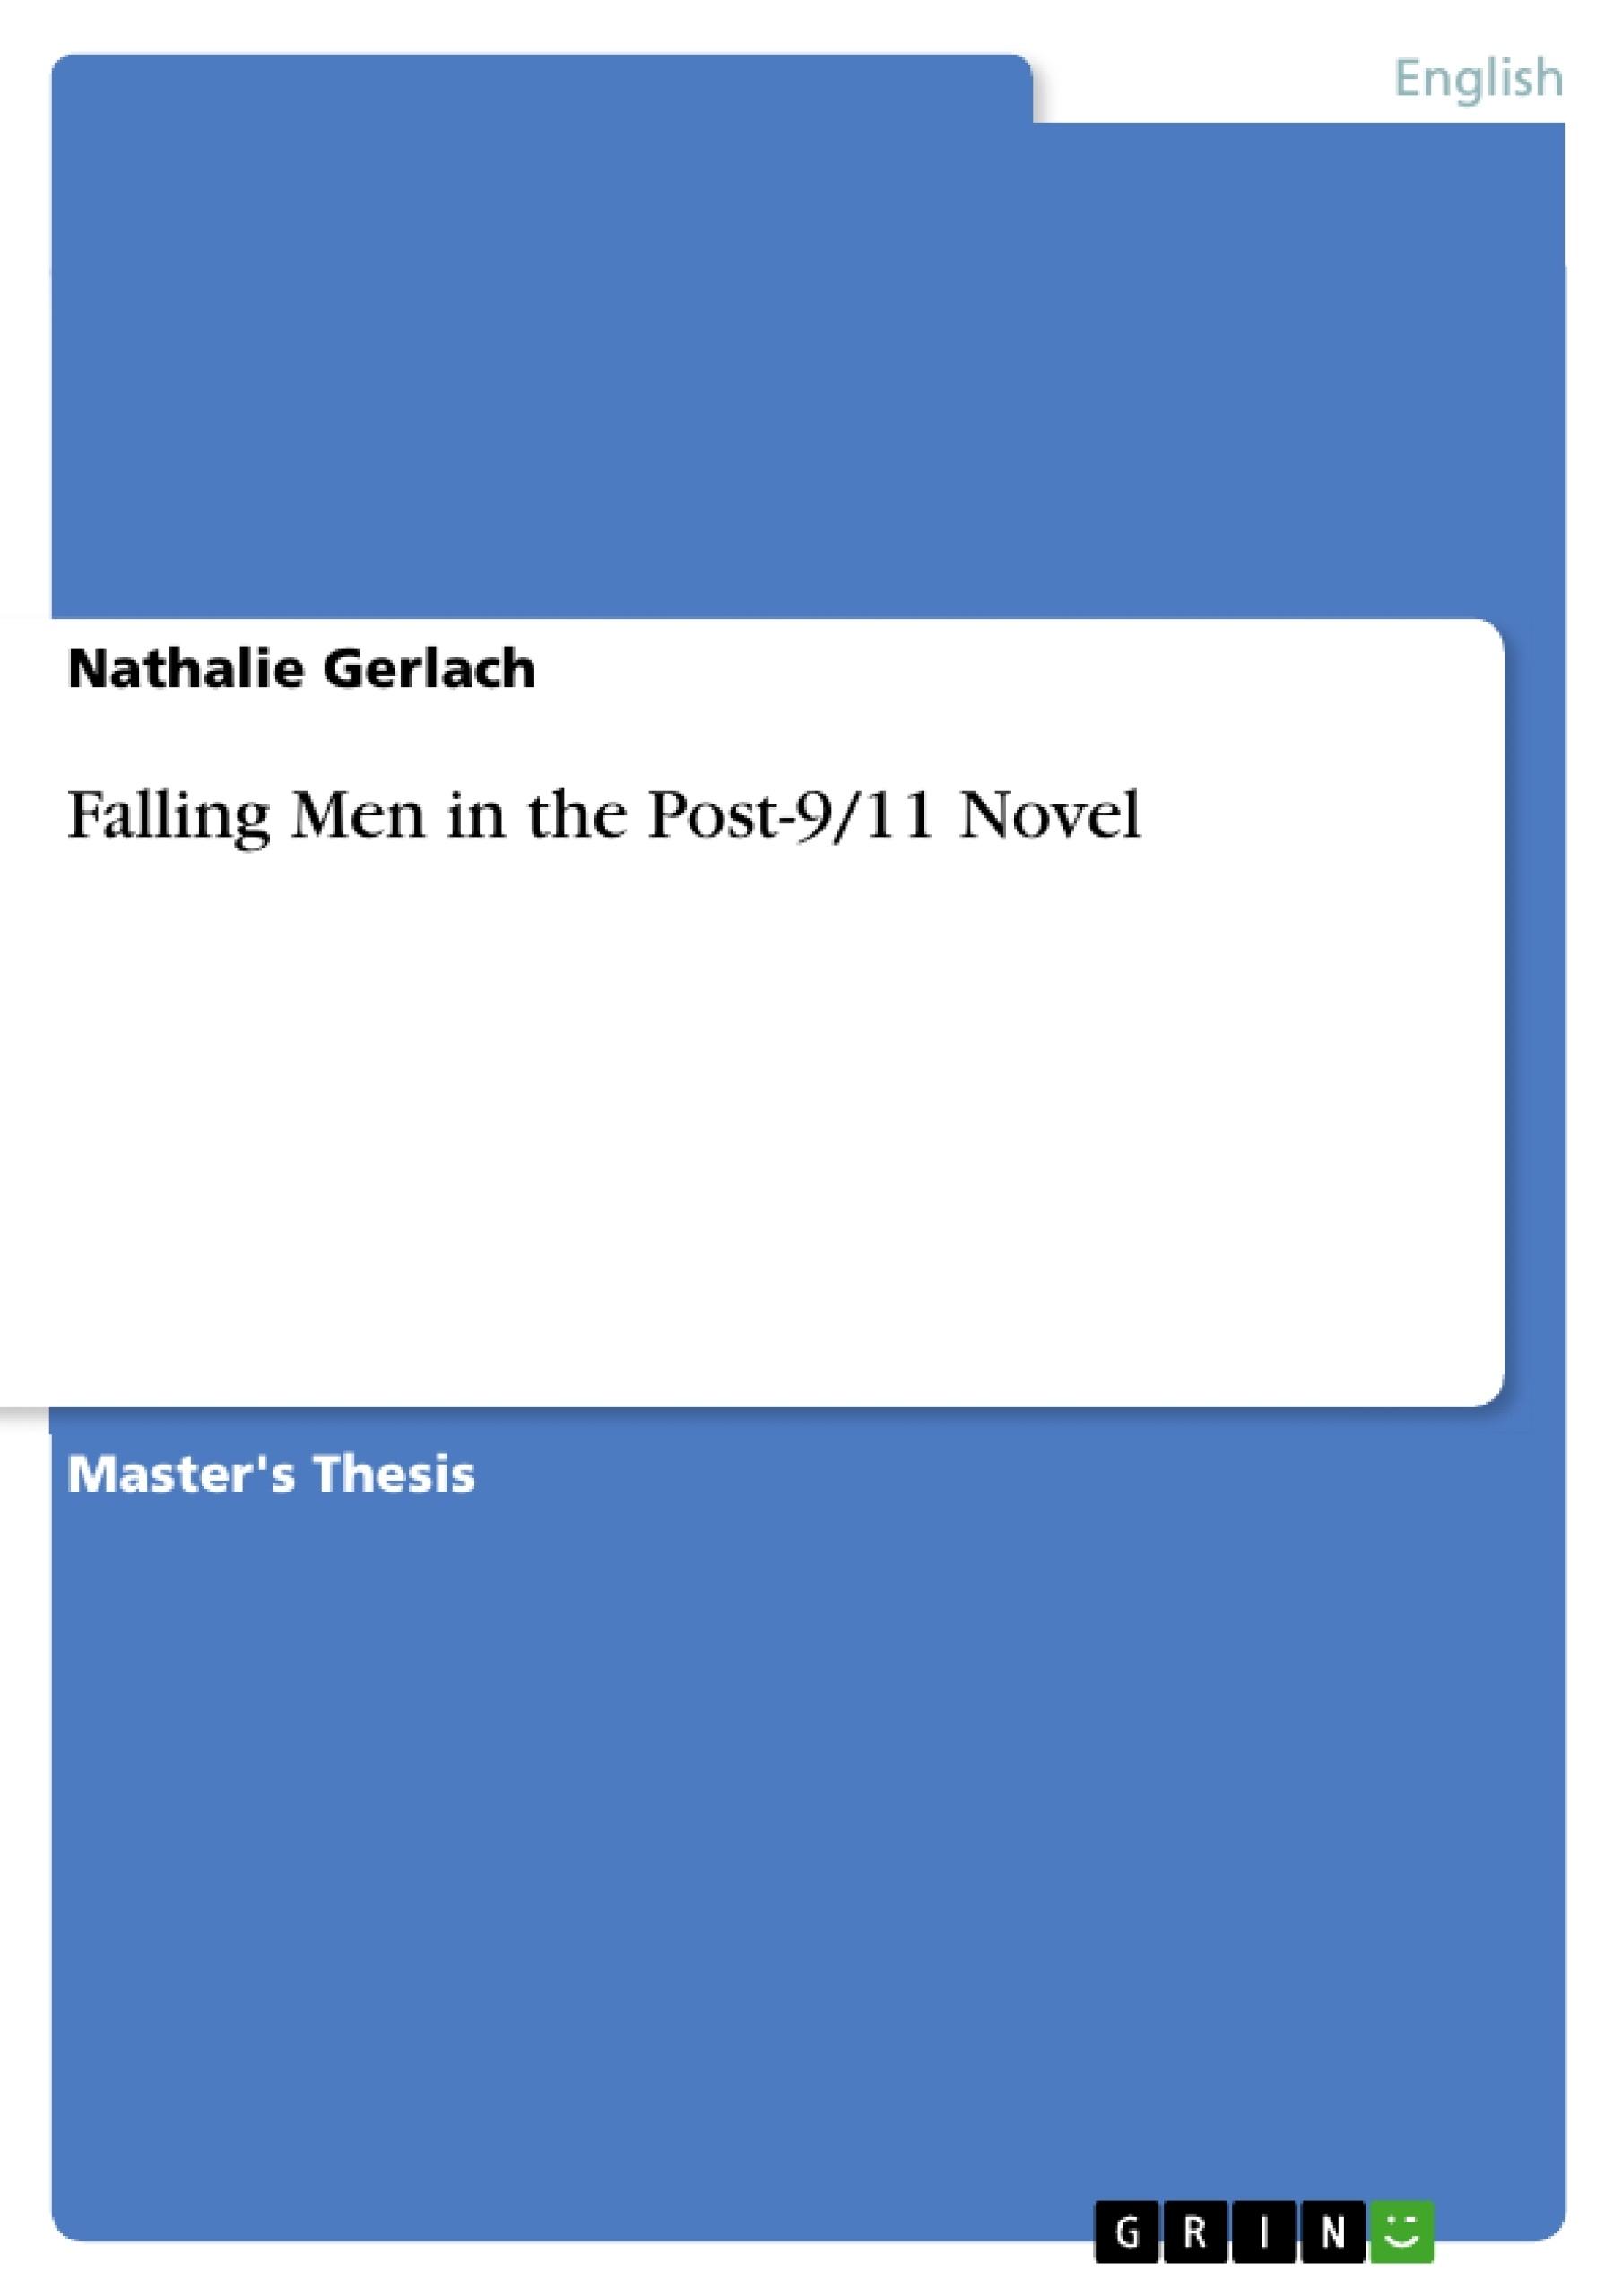 Title: Falling Men in the Post-9/11 Novel